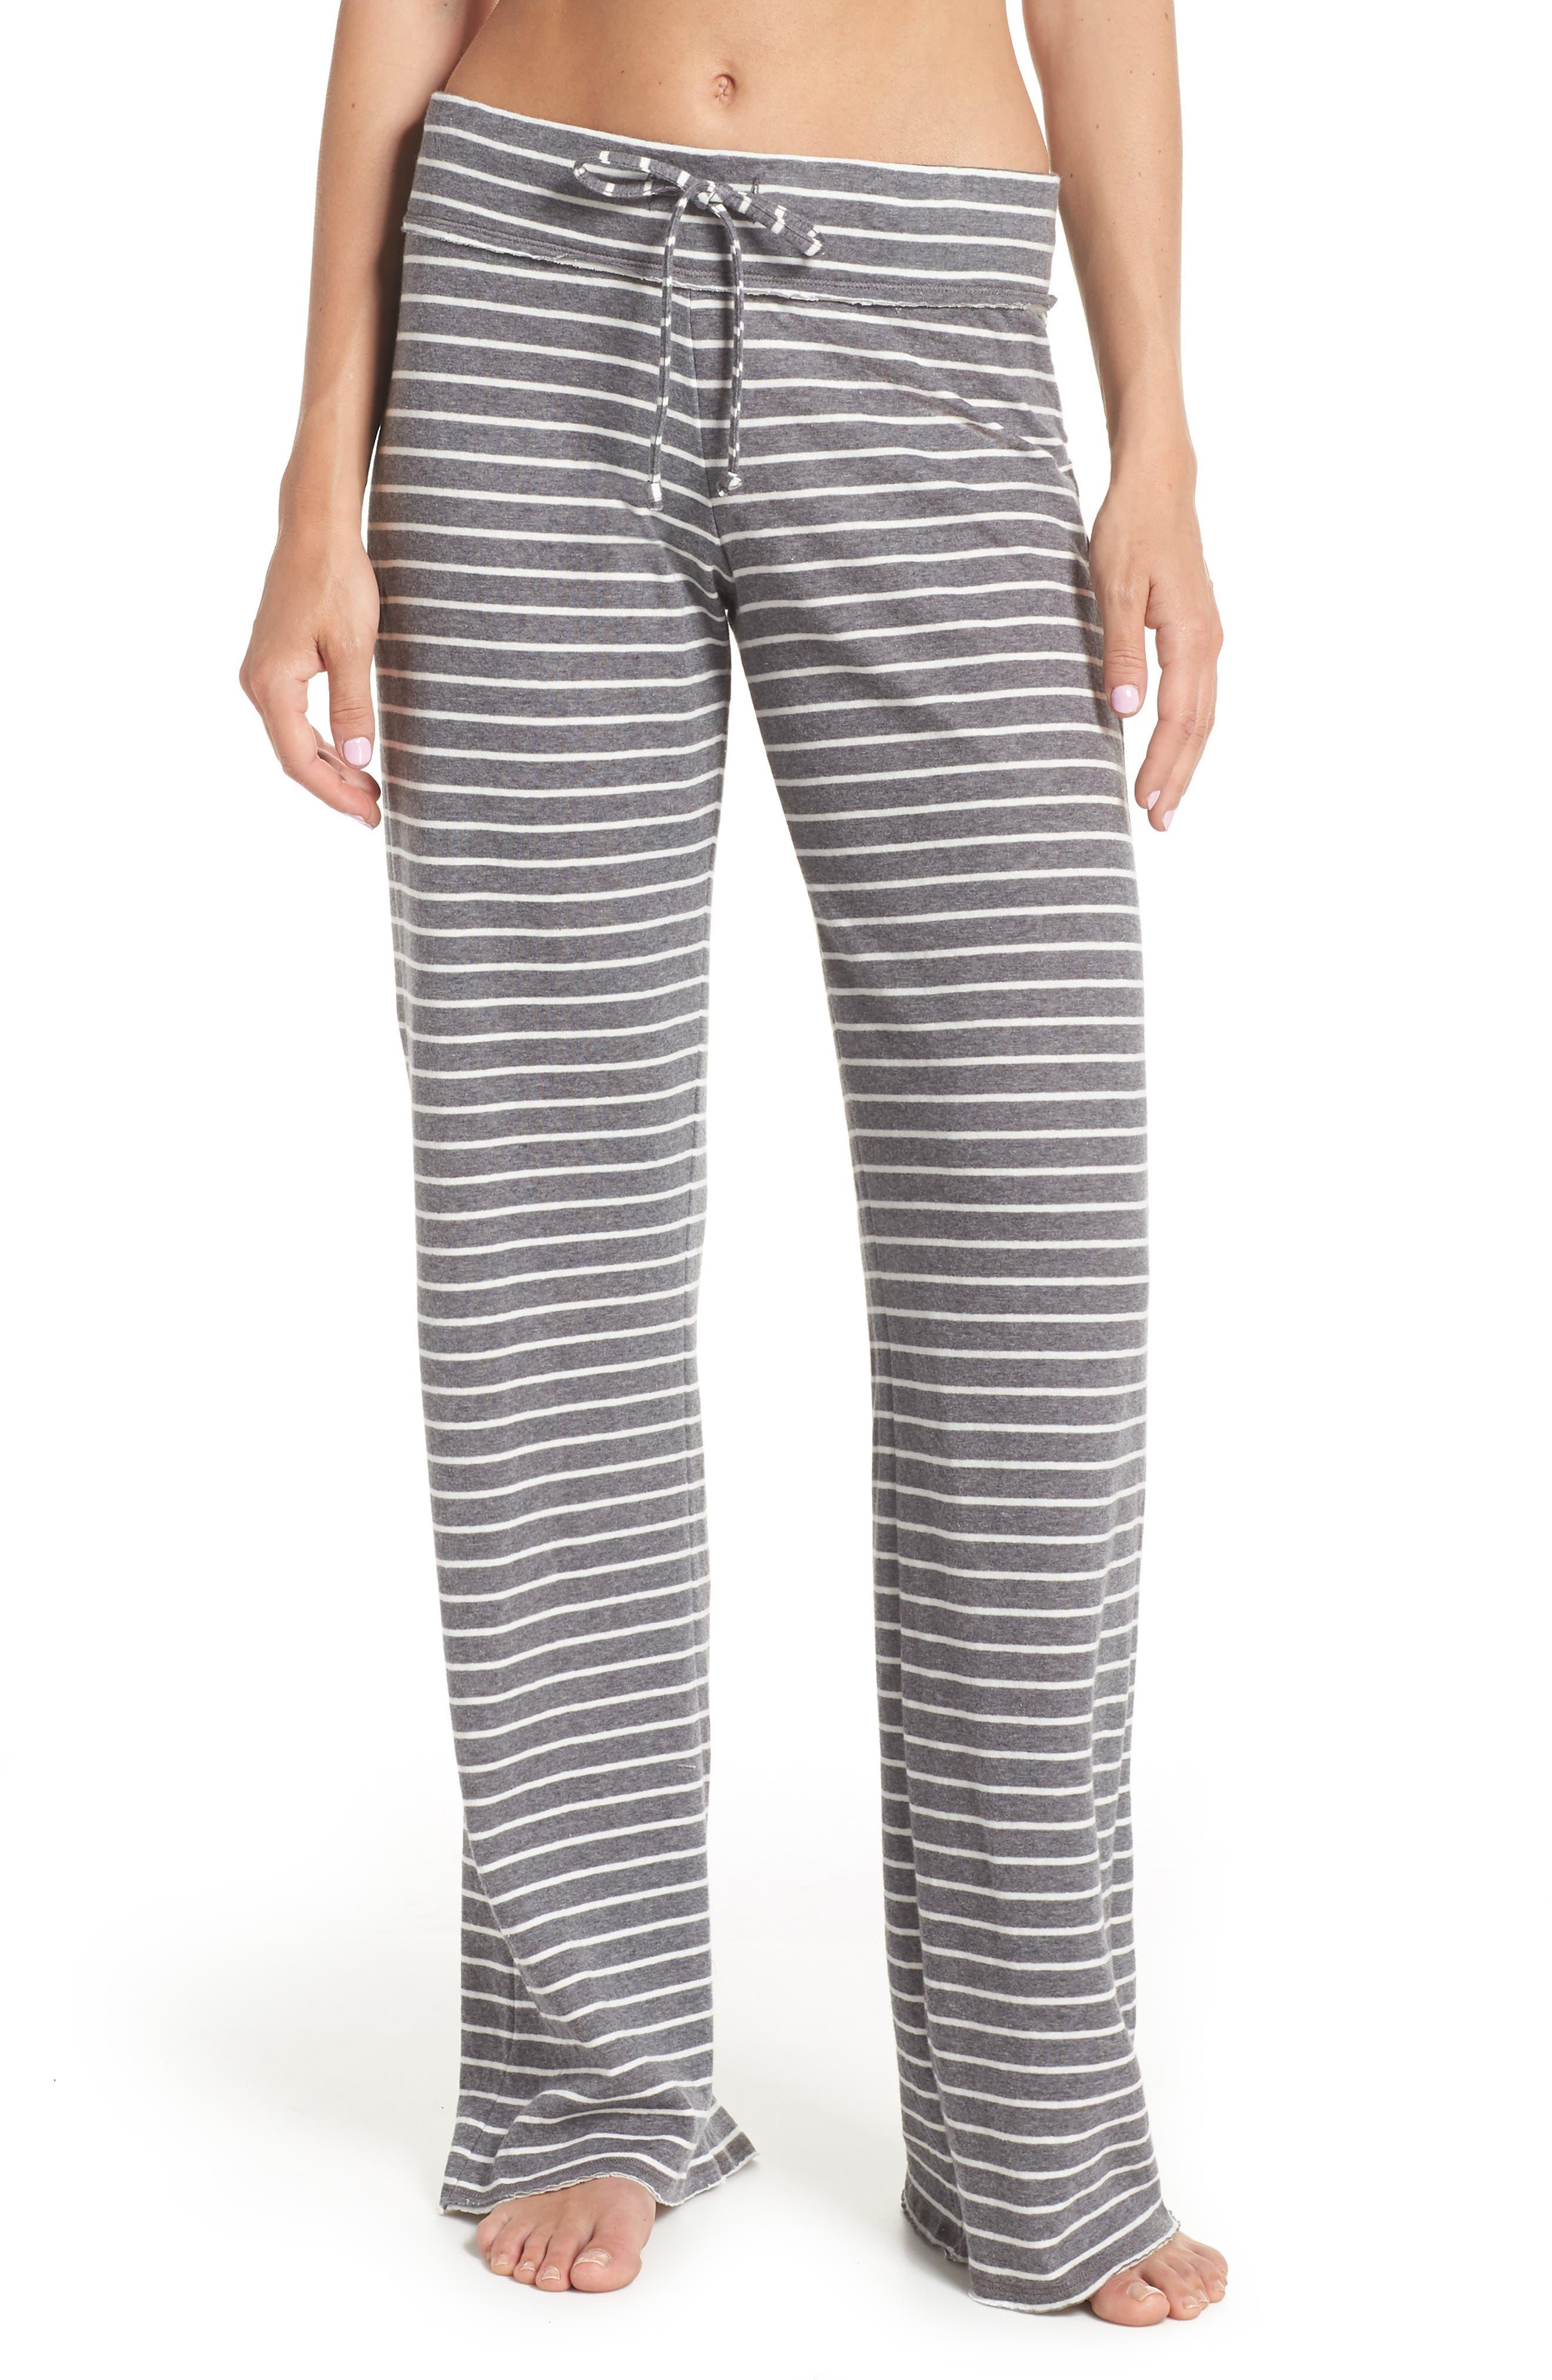 'Lazy Mornings' Lounge Pants,                         Main,                         color, GREY PAVEMENT BELLA STRIPE